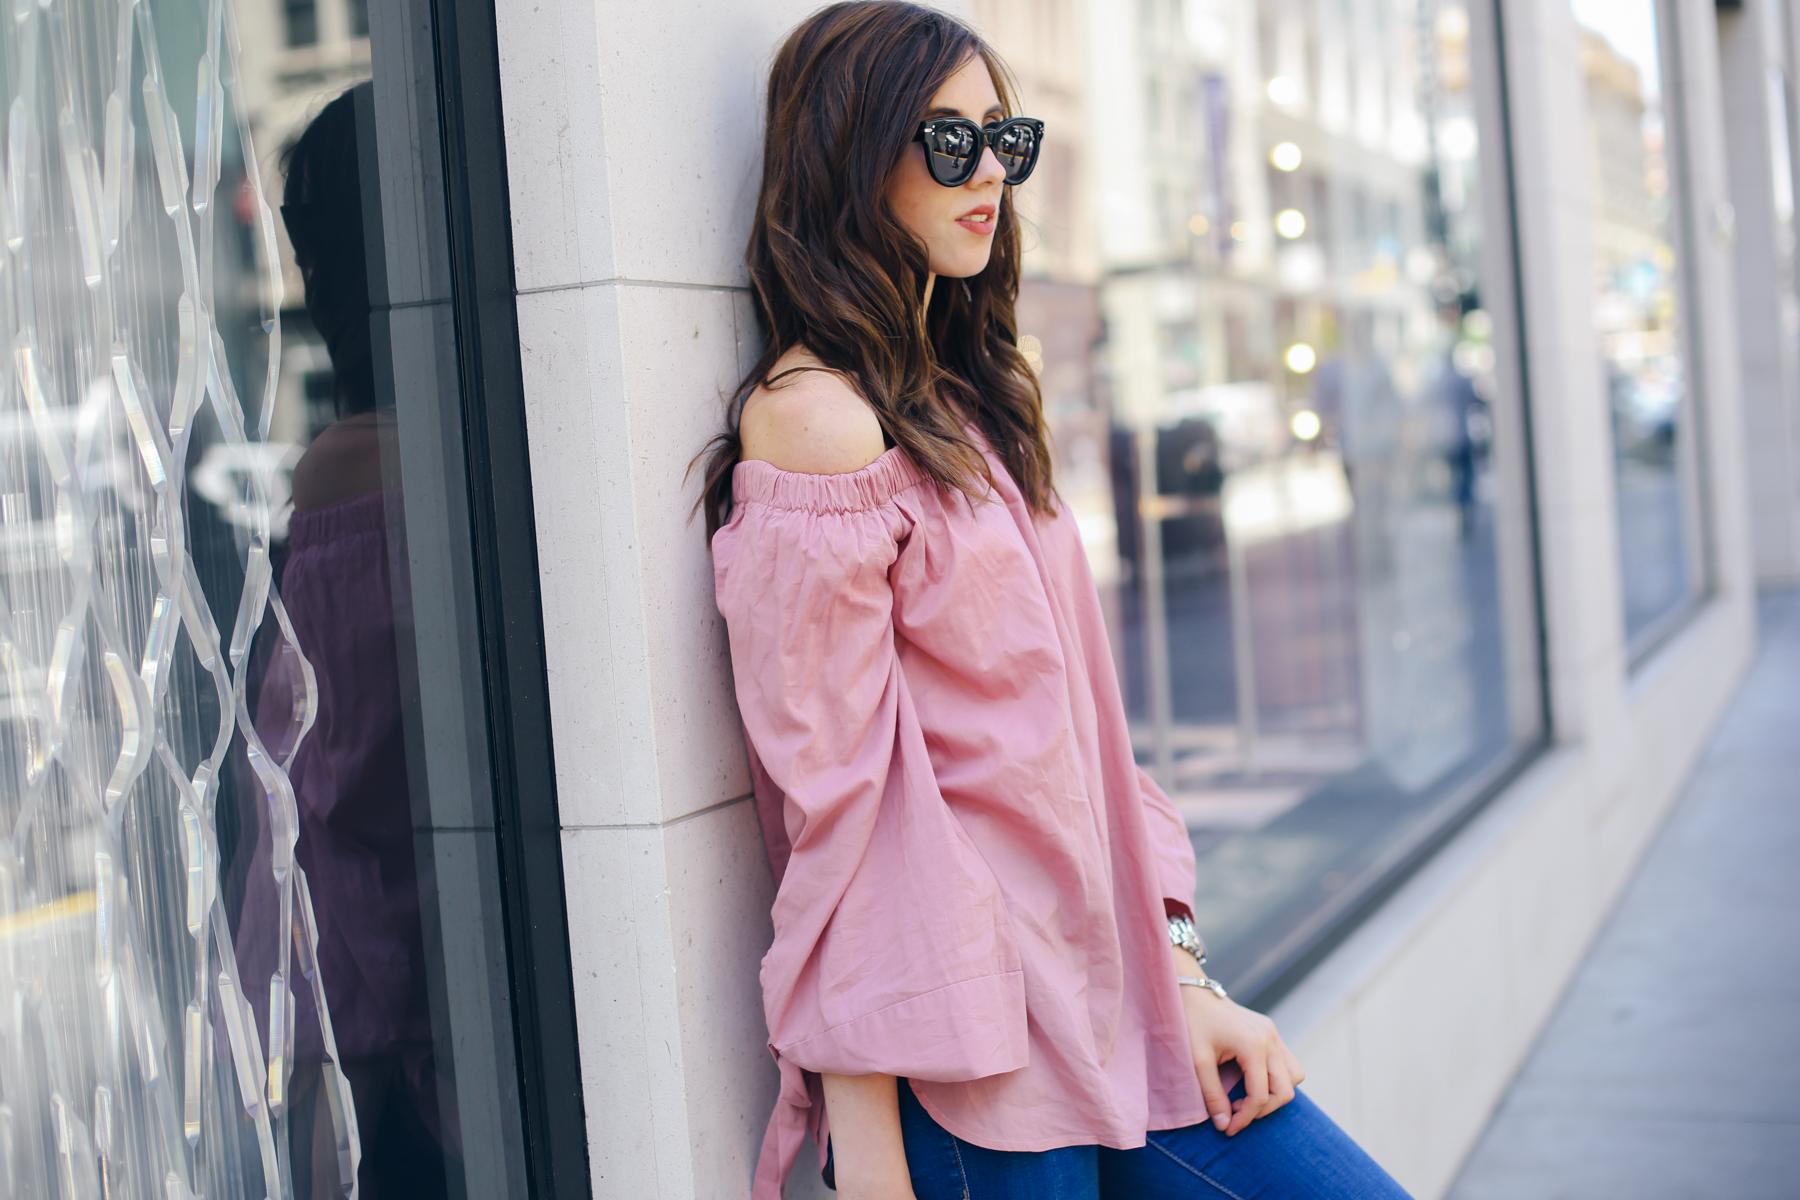 Barbora-Ondracova-FashioninmySoul-Fashion-Blogger-Photography-RyanbyRyanChua-7403